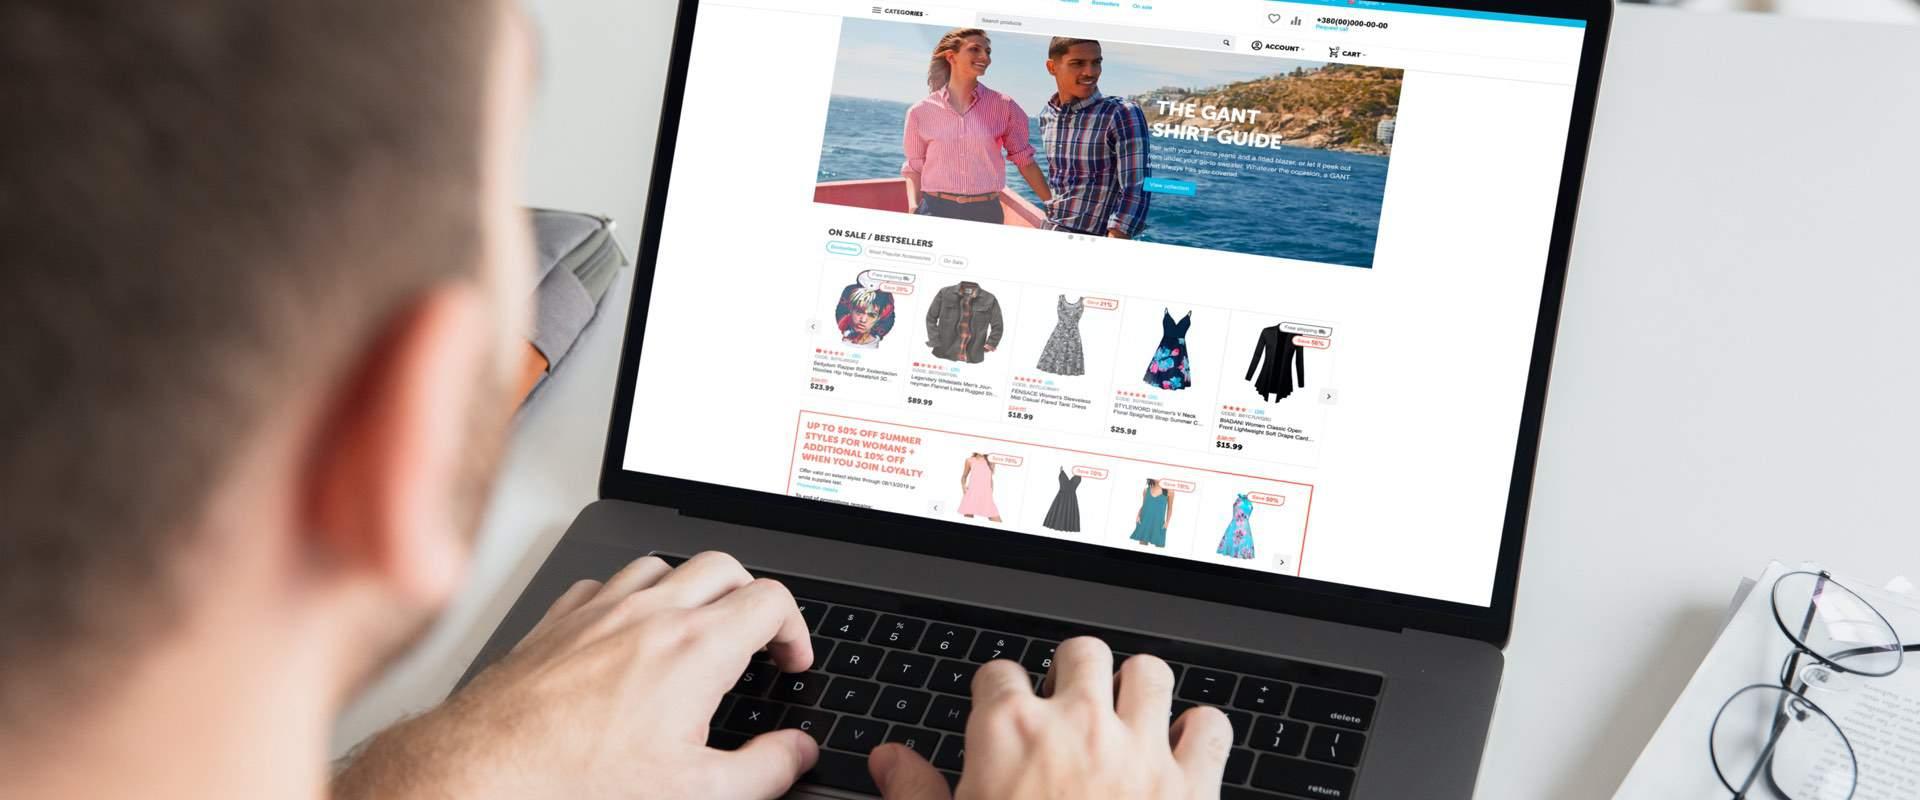 CS-Cart Multi-Vendor Marketplace Platform & Shopping Cart